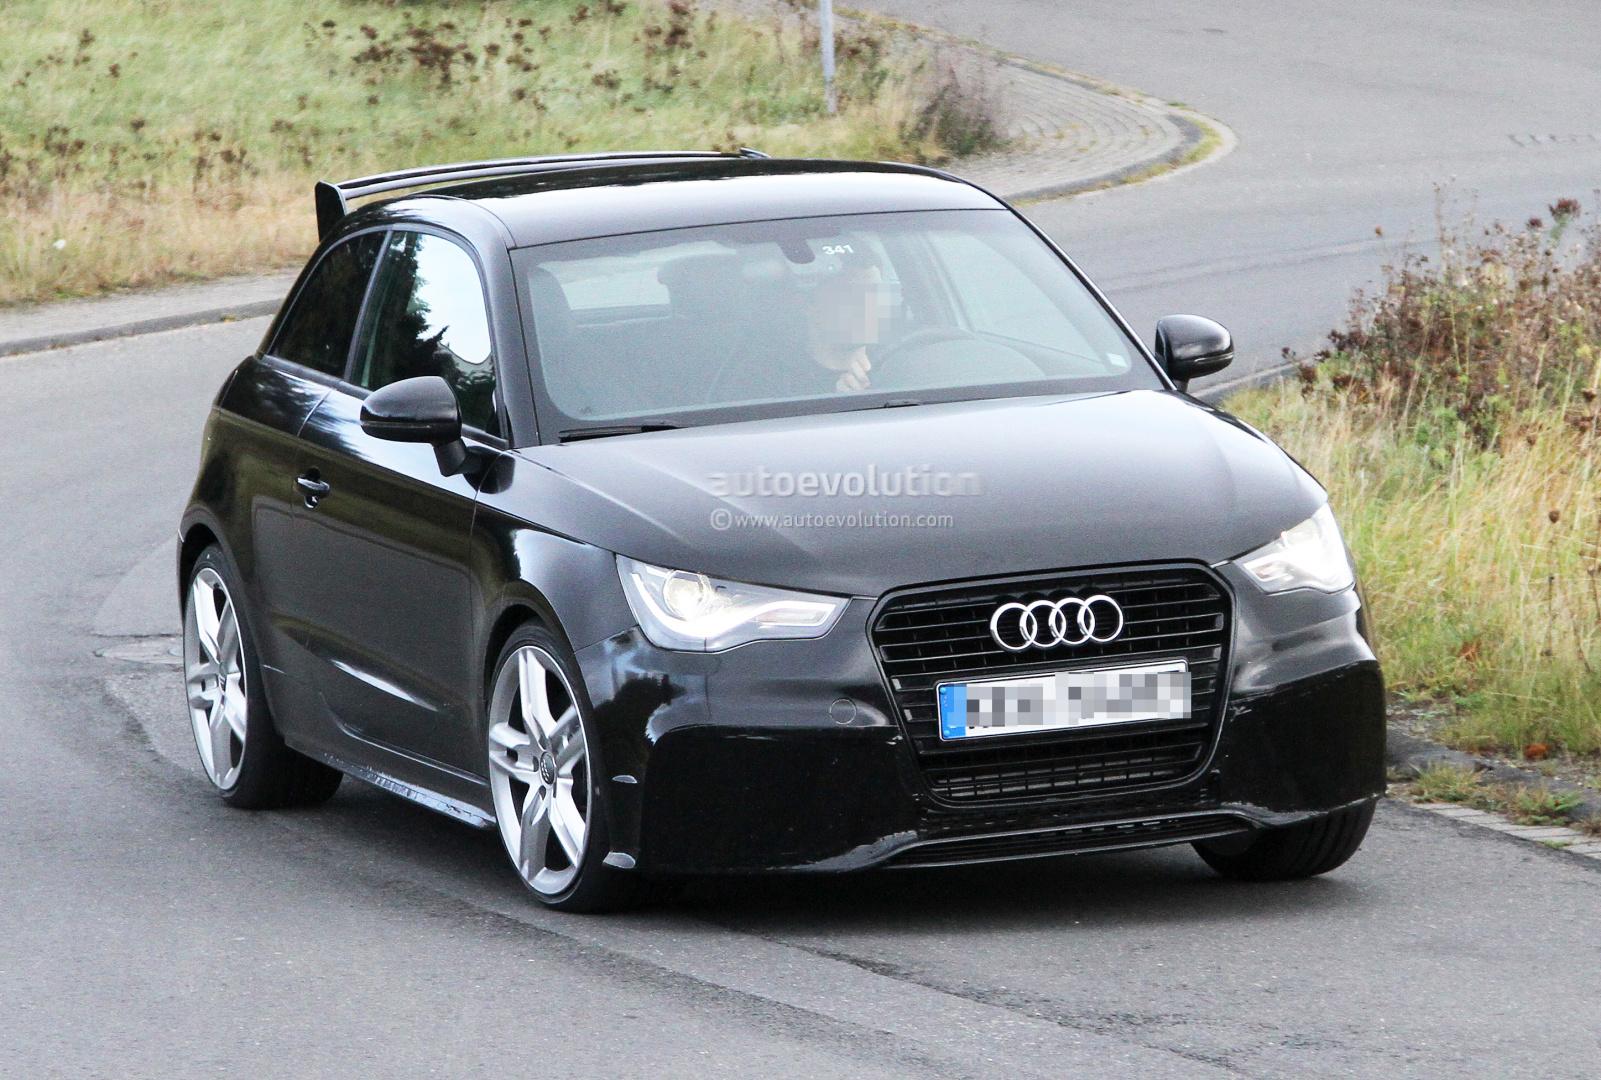 Spyshots 2012 Audi Rs1 Autoevolution